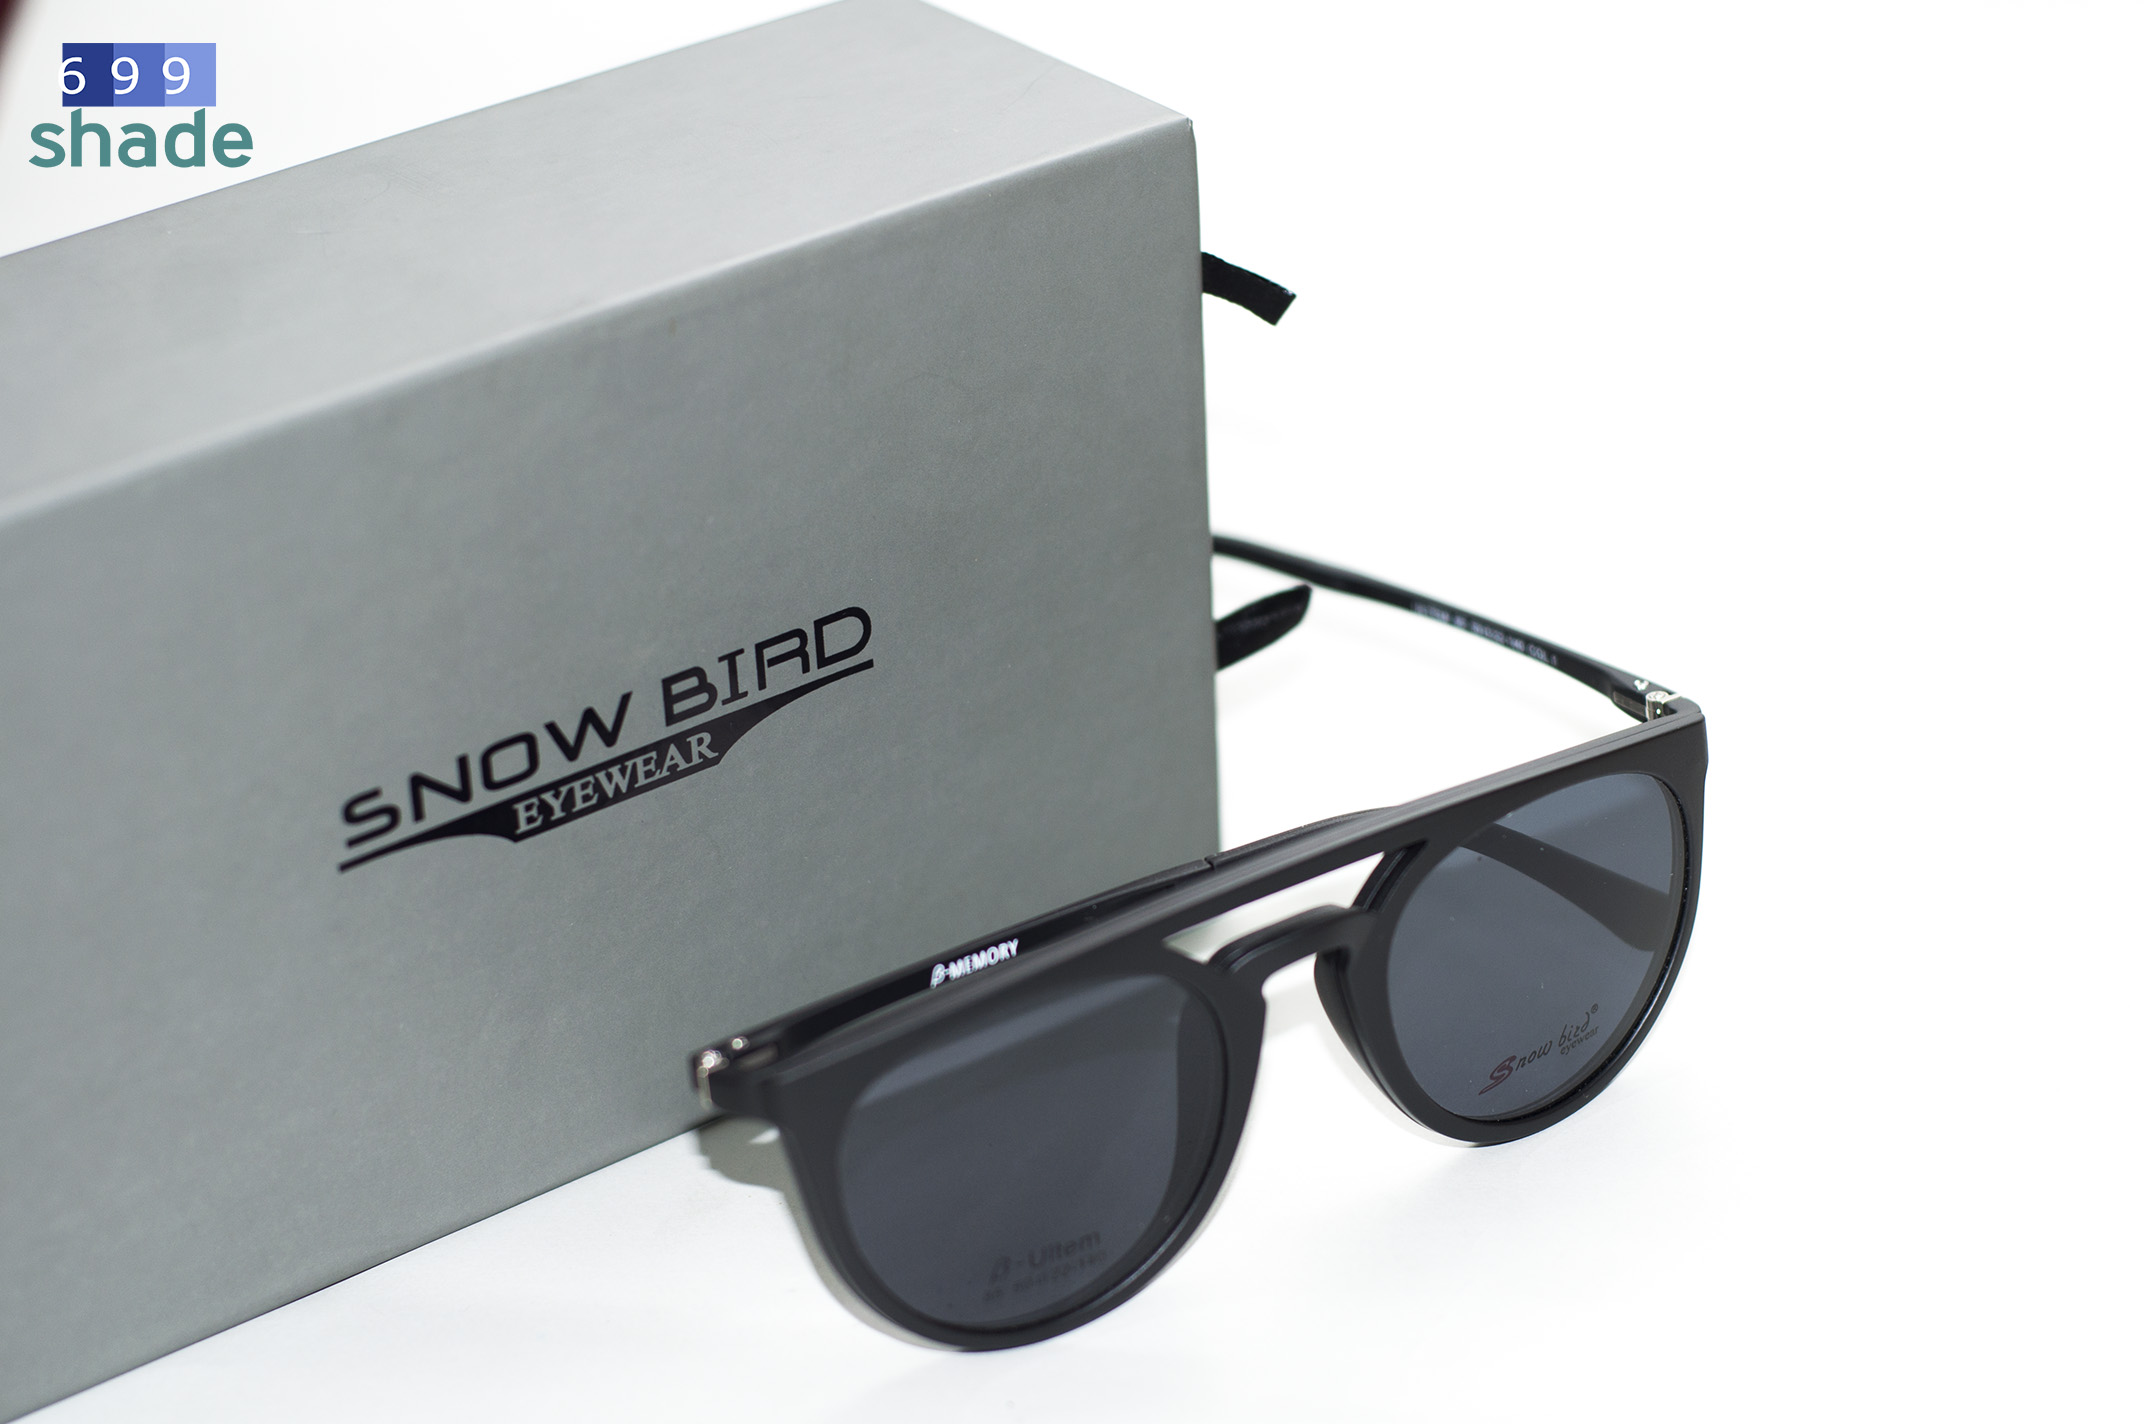 SNOW BIRD 85-C1 [แว่นคลิปออนแม่เหล็ก]